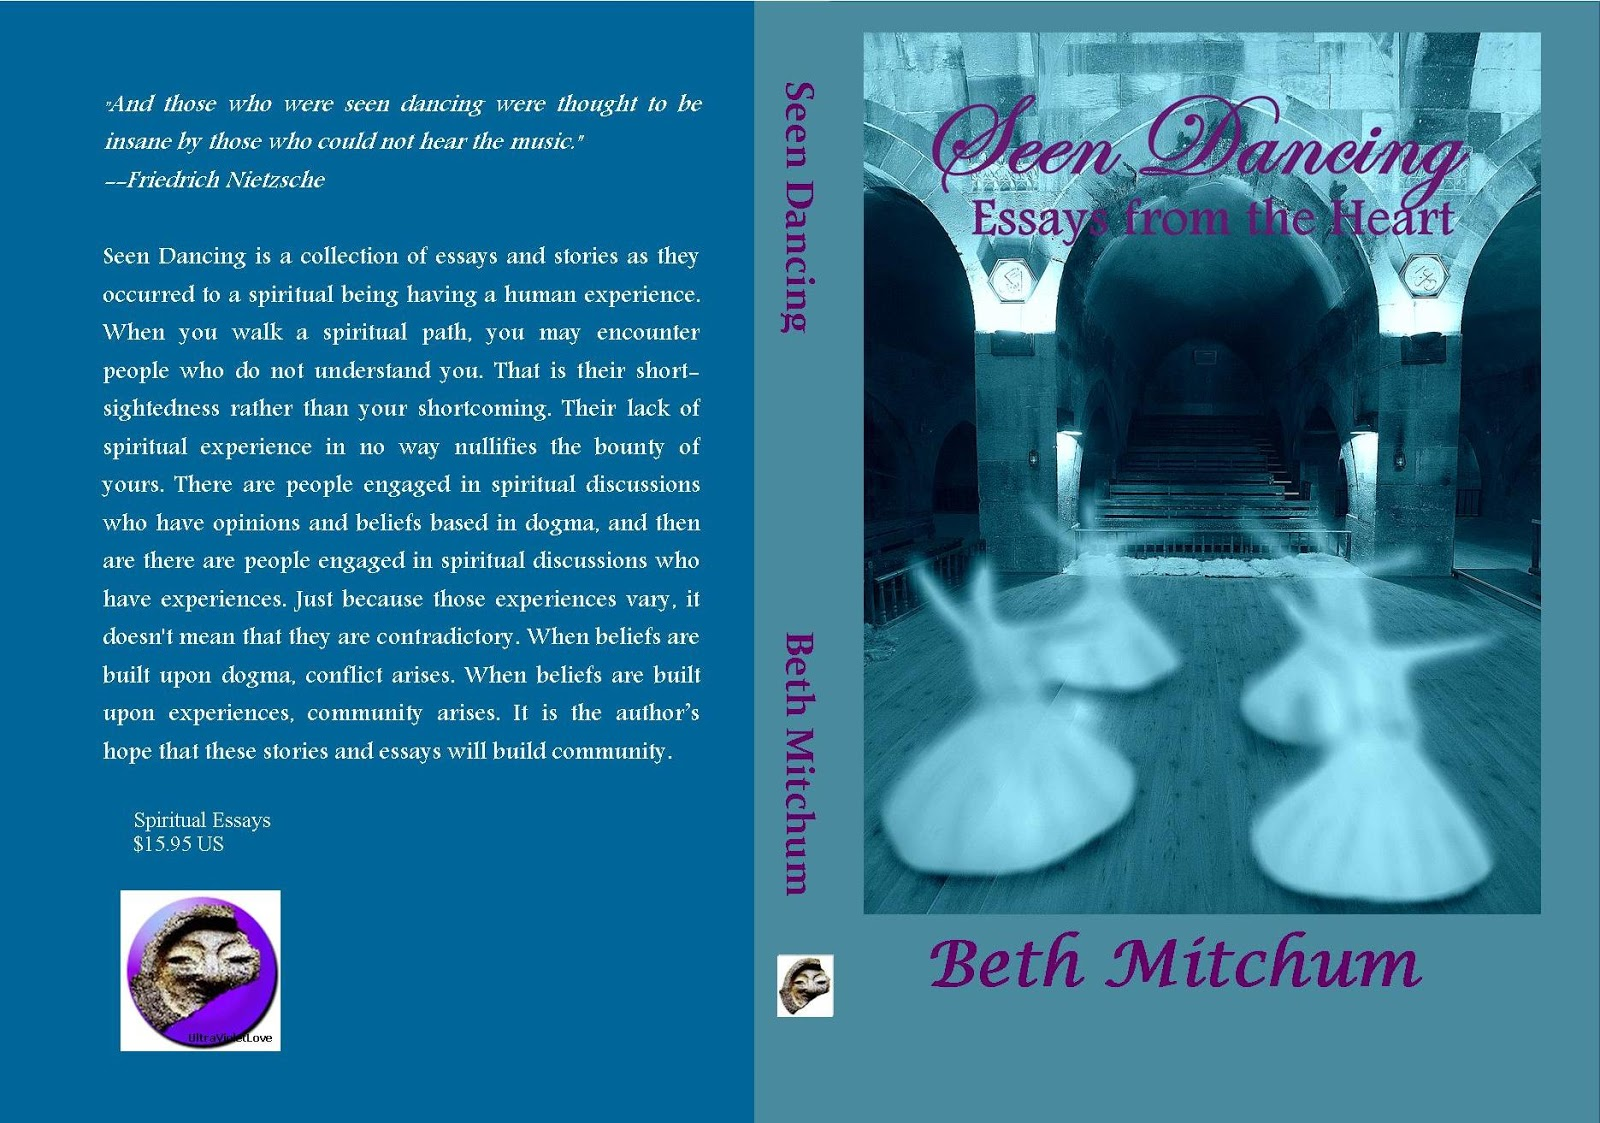 dancing with the heart essay Encuentra seen dancing: essays from the heart: volume 1 (mystic angel healing) de beth mitchum (isbn: 9781481826181) en amazon envíos gratis a partir de 19.